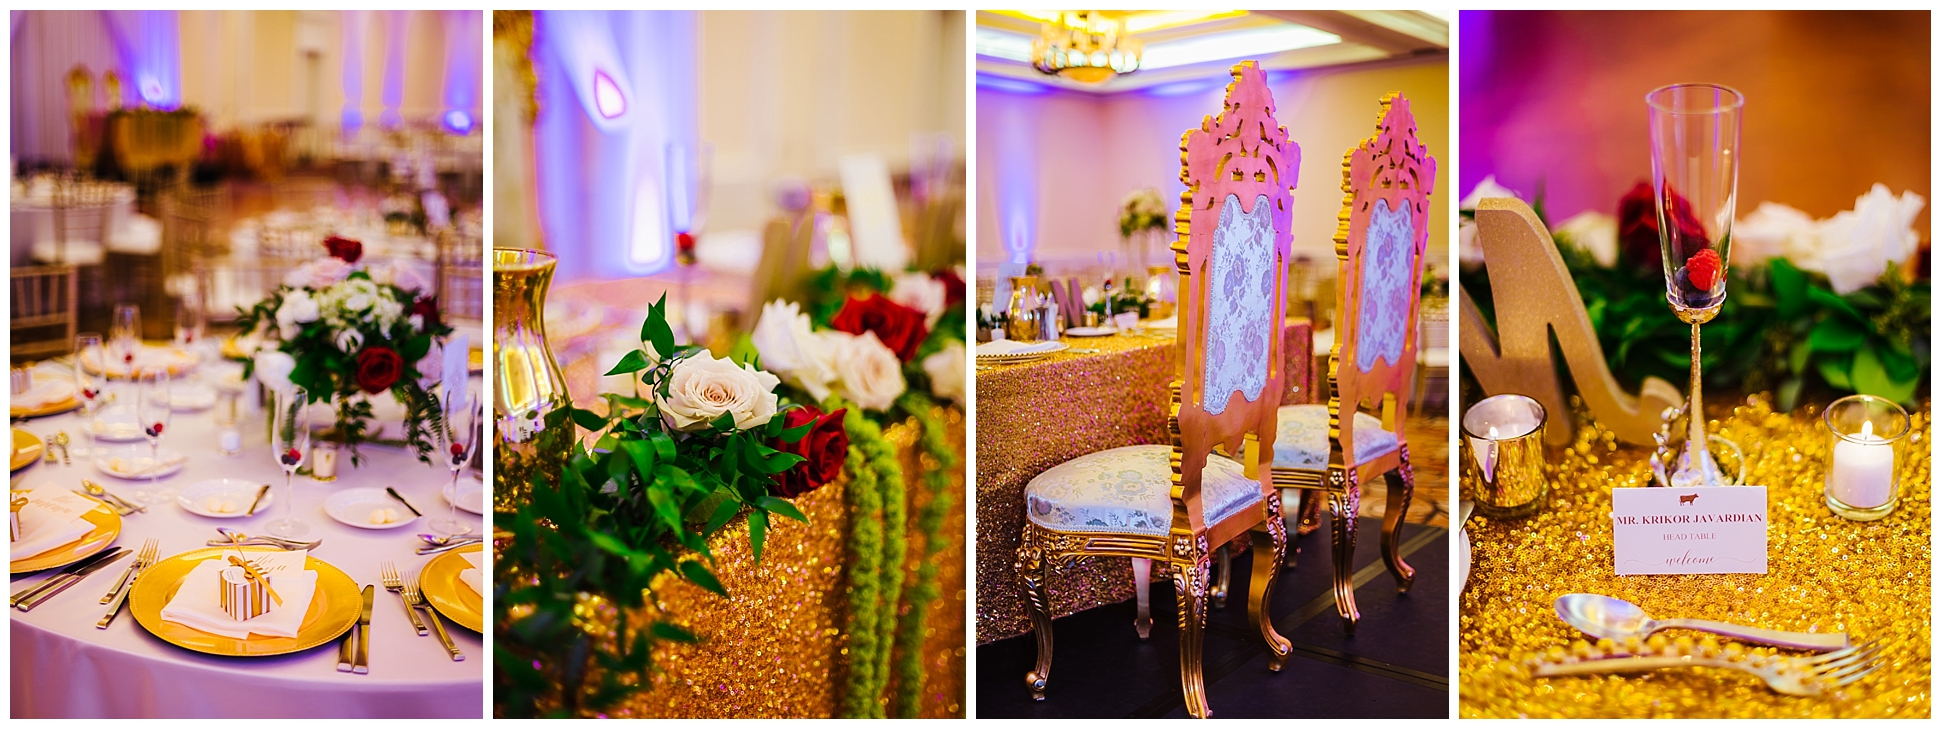 indian-armenian-clearwater-wedding-chic-luxury-photogaphy_0088.jpg